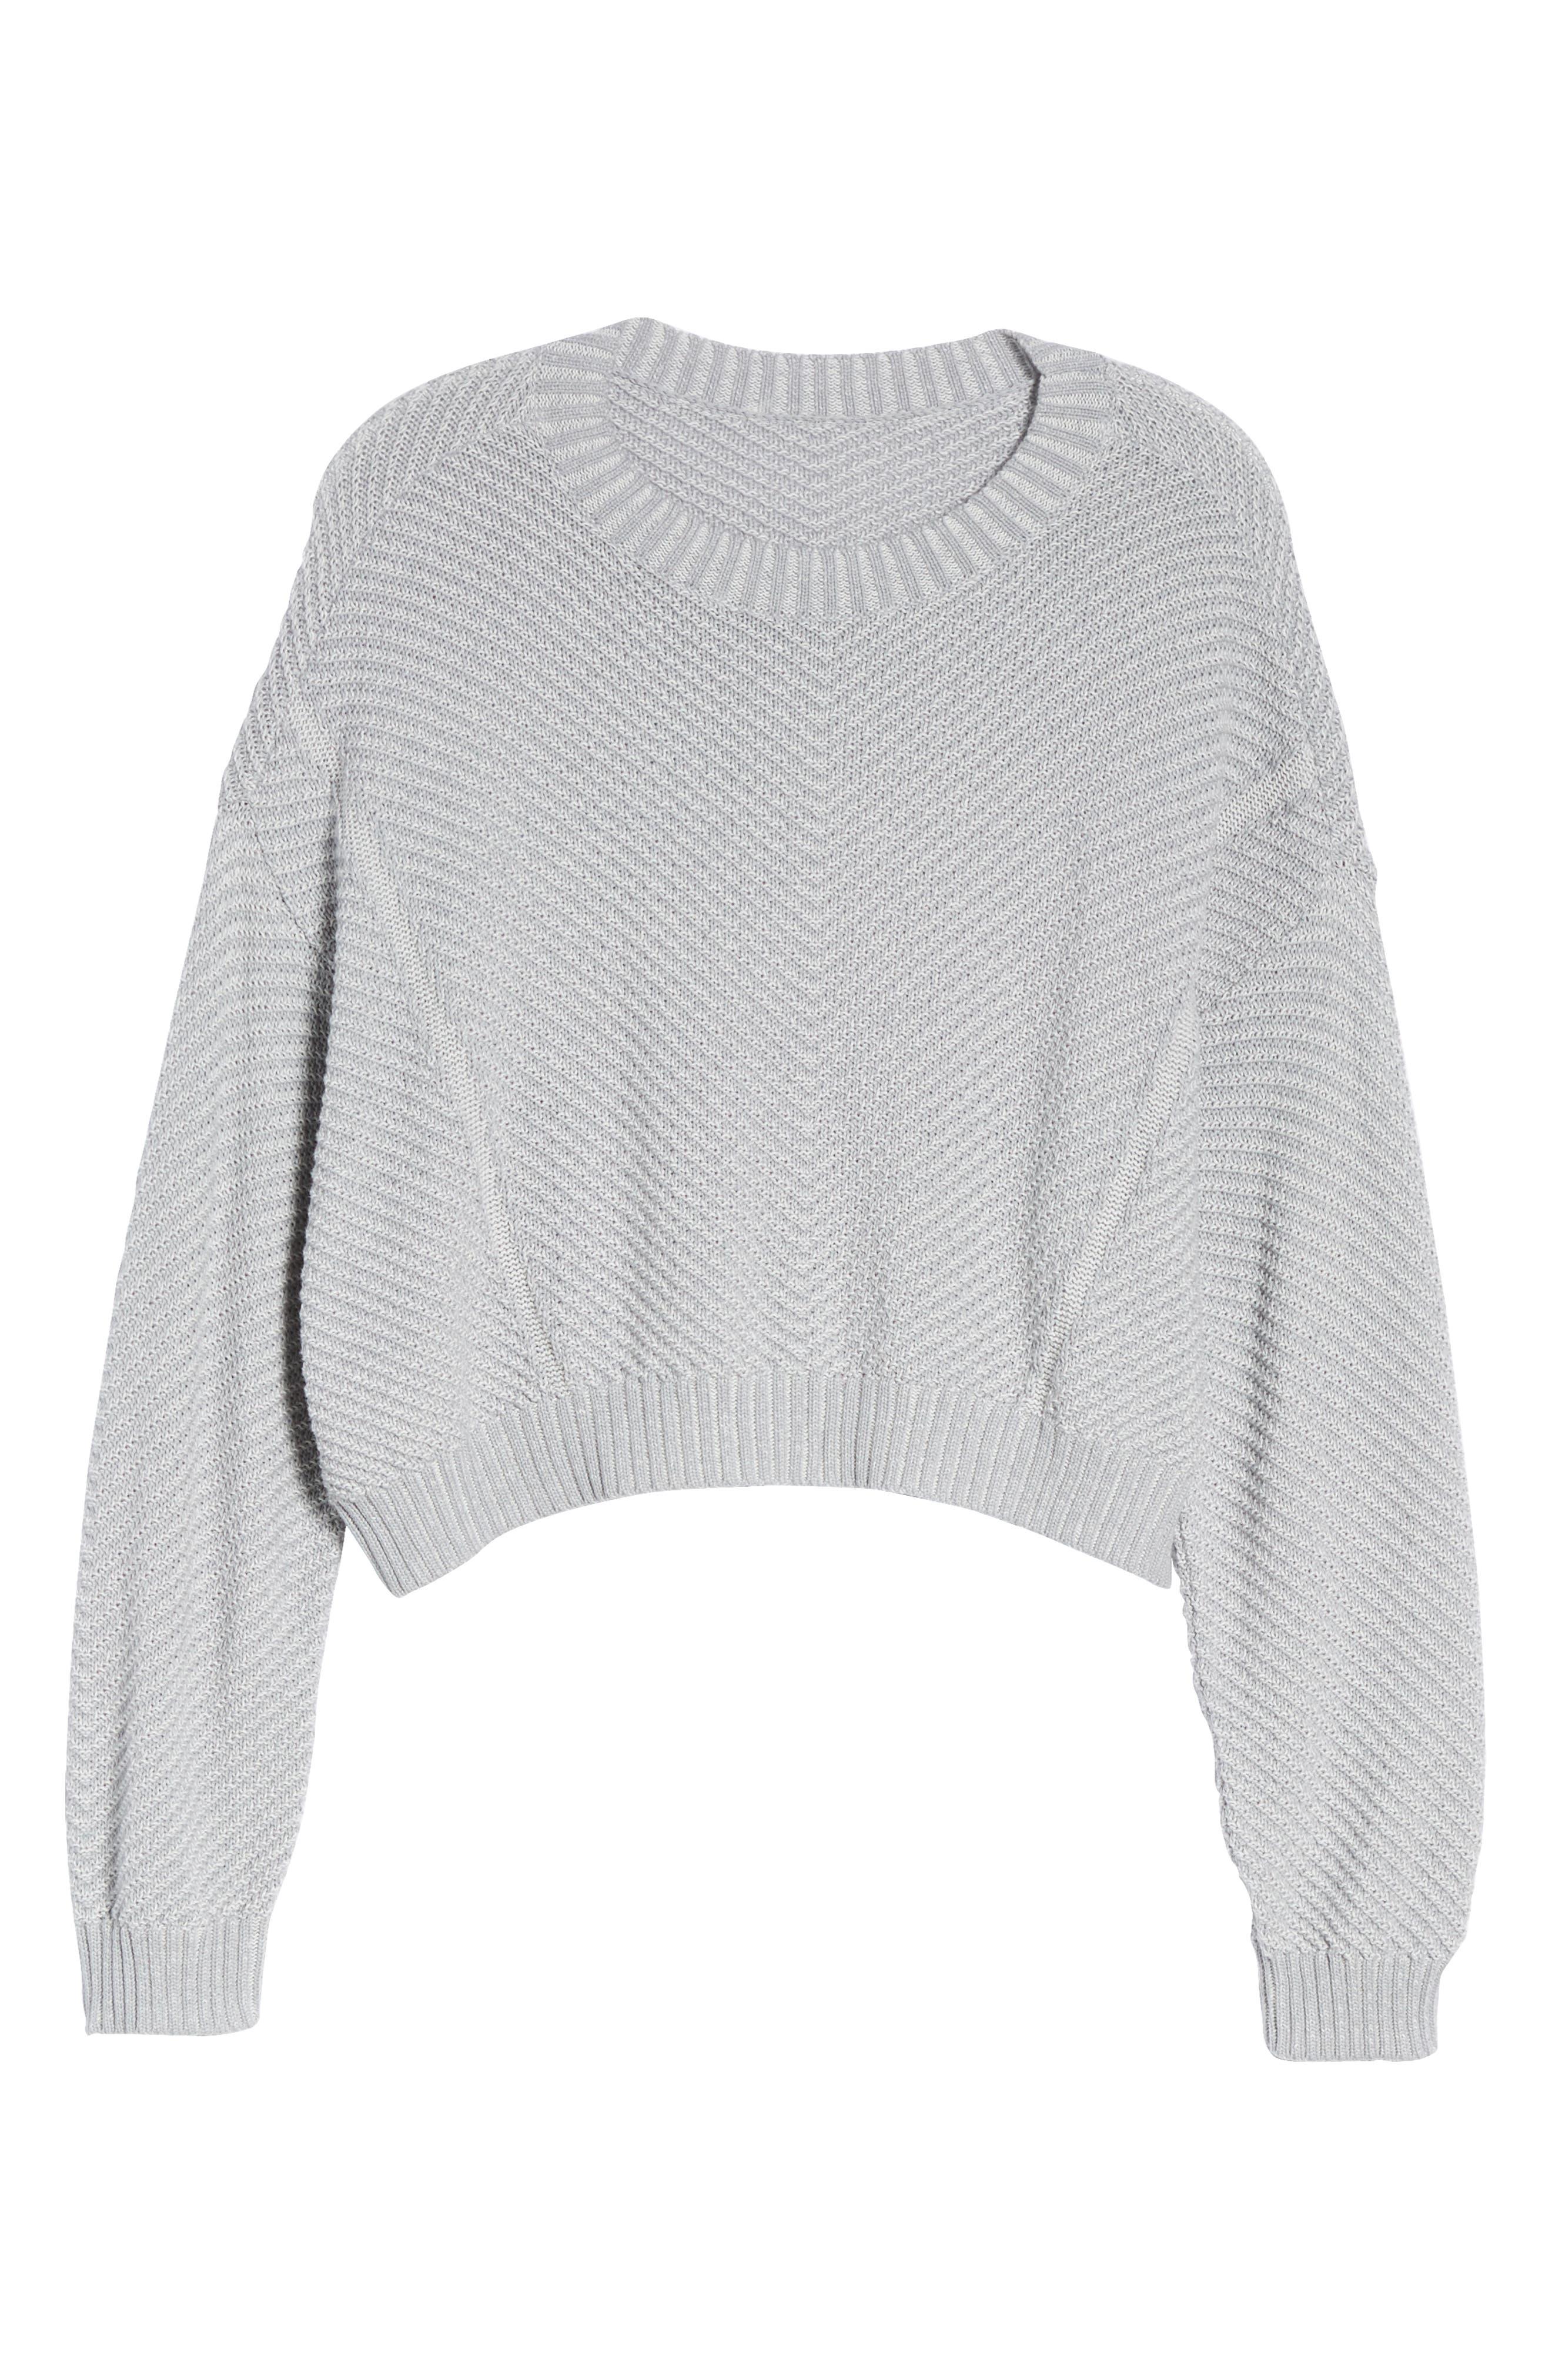 Plaited Drop Shoulder Sweater,                             Alternate thumbnail 7, color,                             050